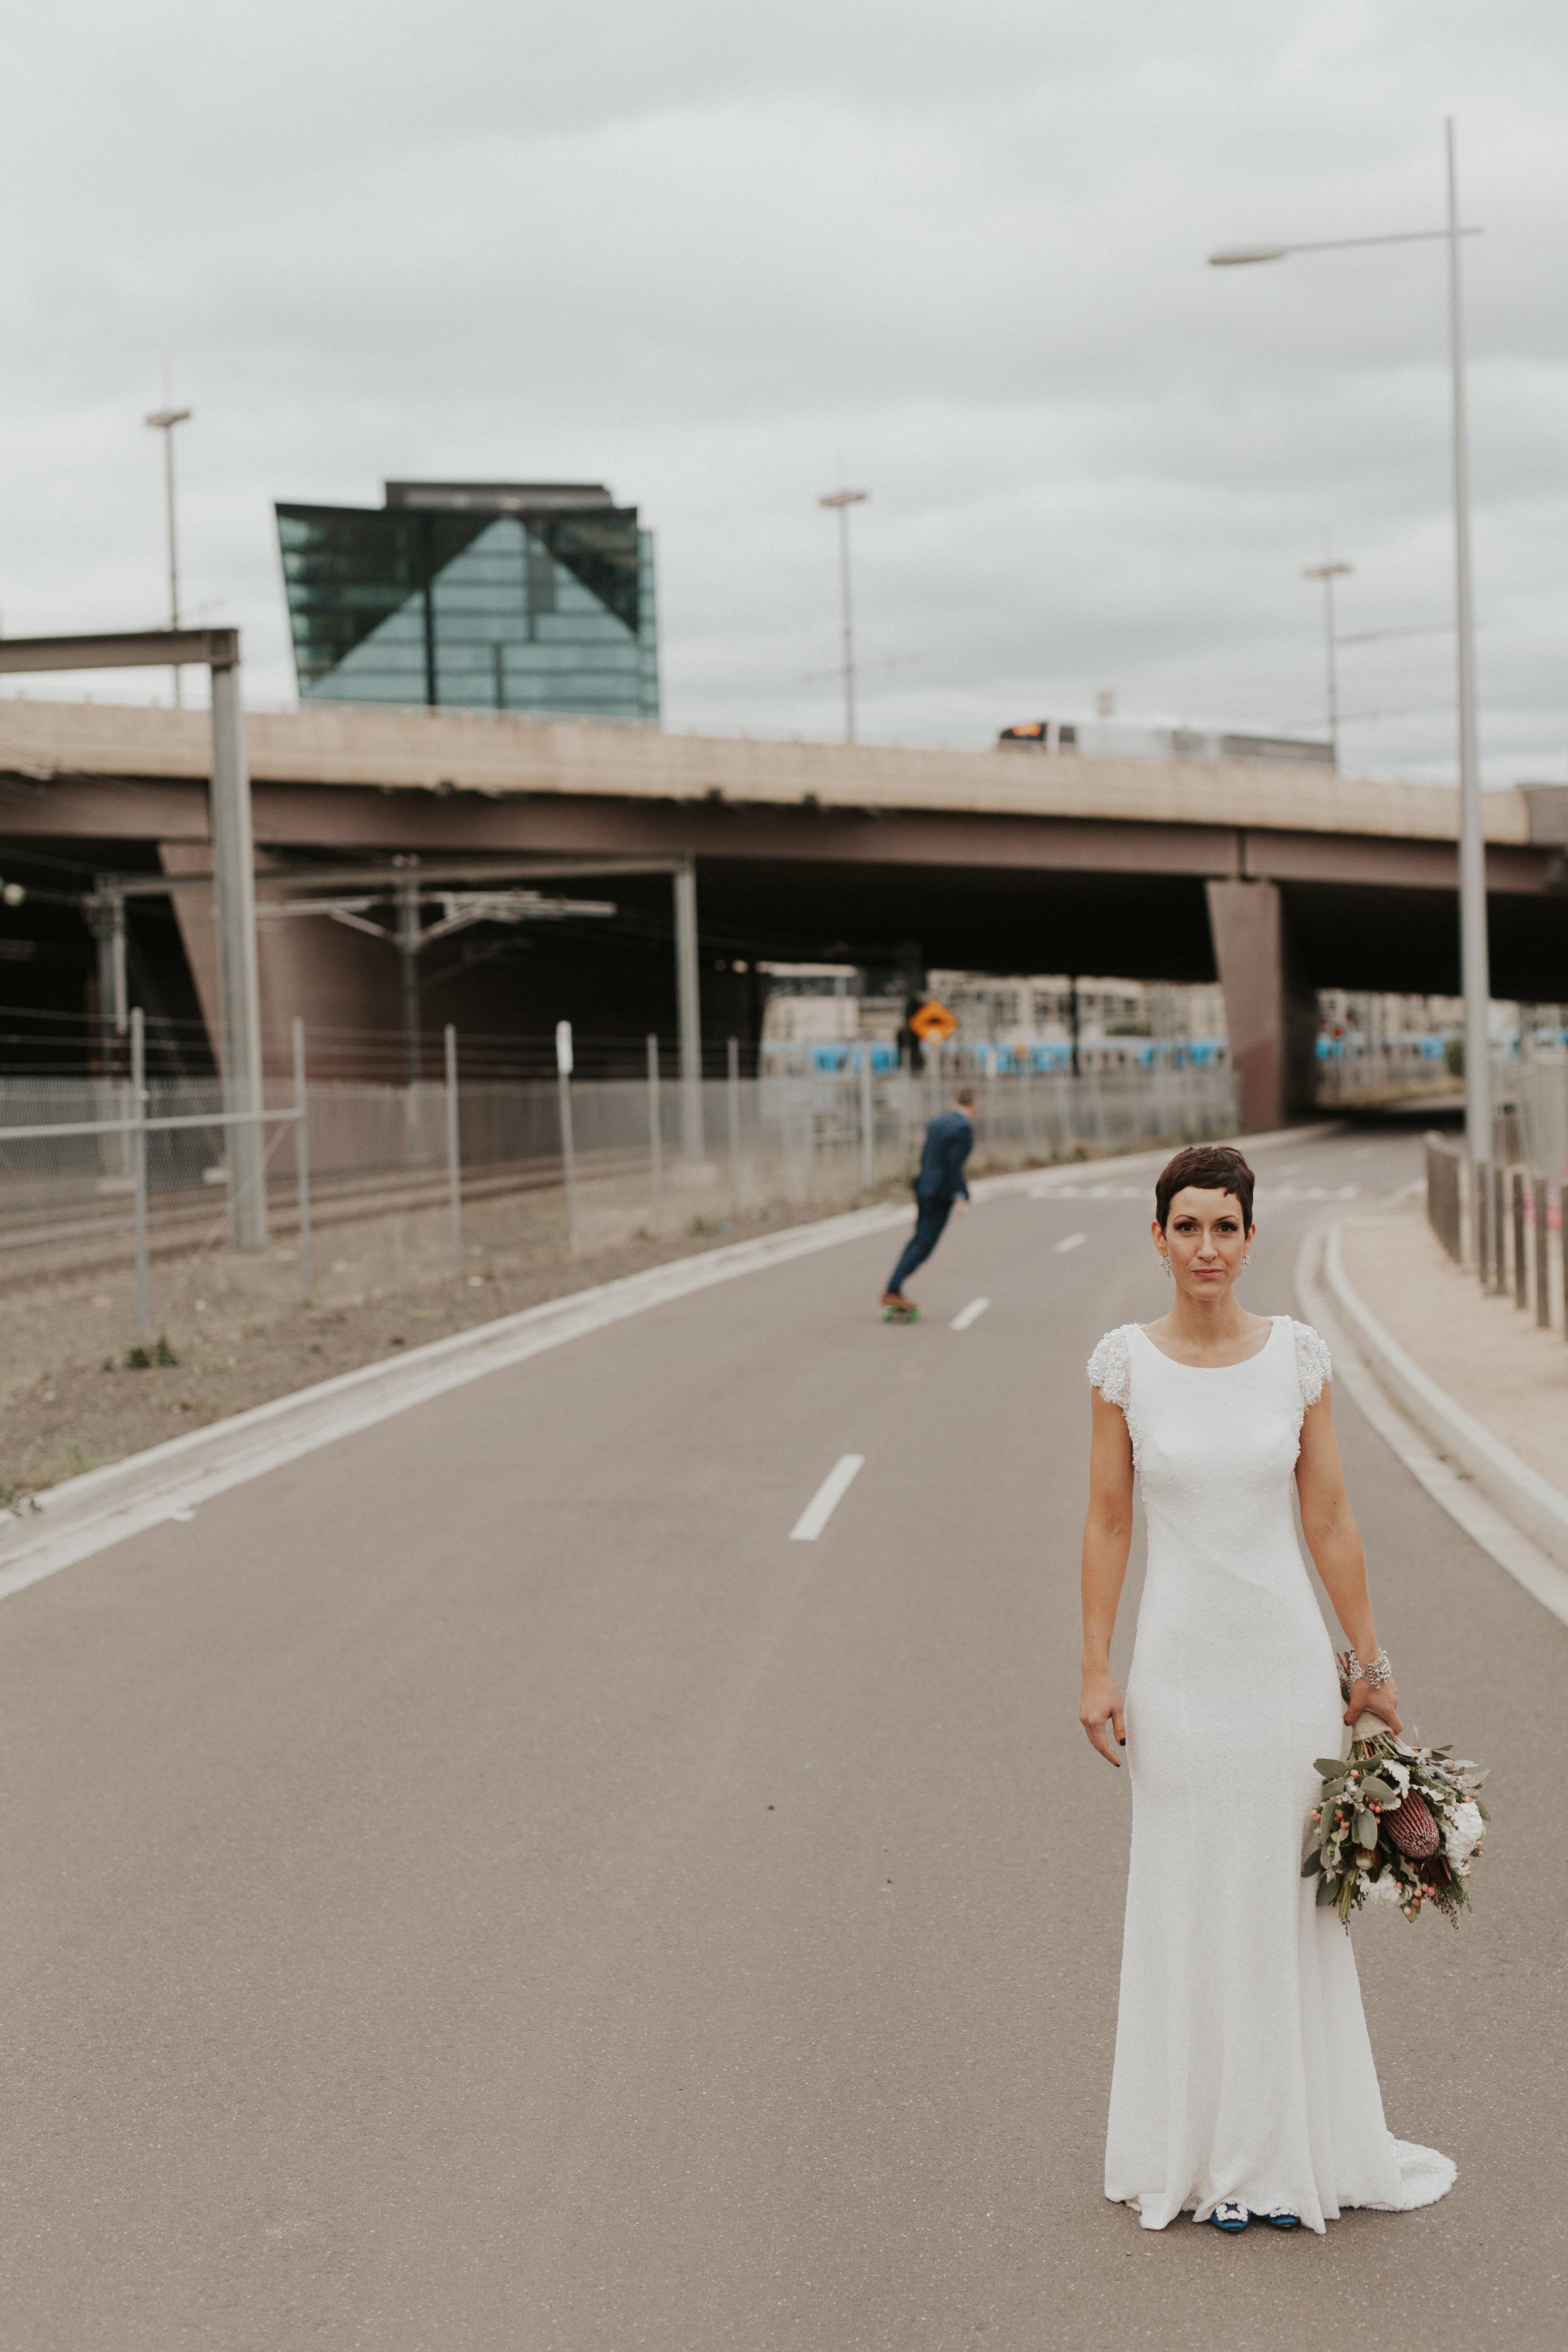 Melbourne-city-wedding-emotionsandmath-050.jpg